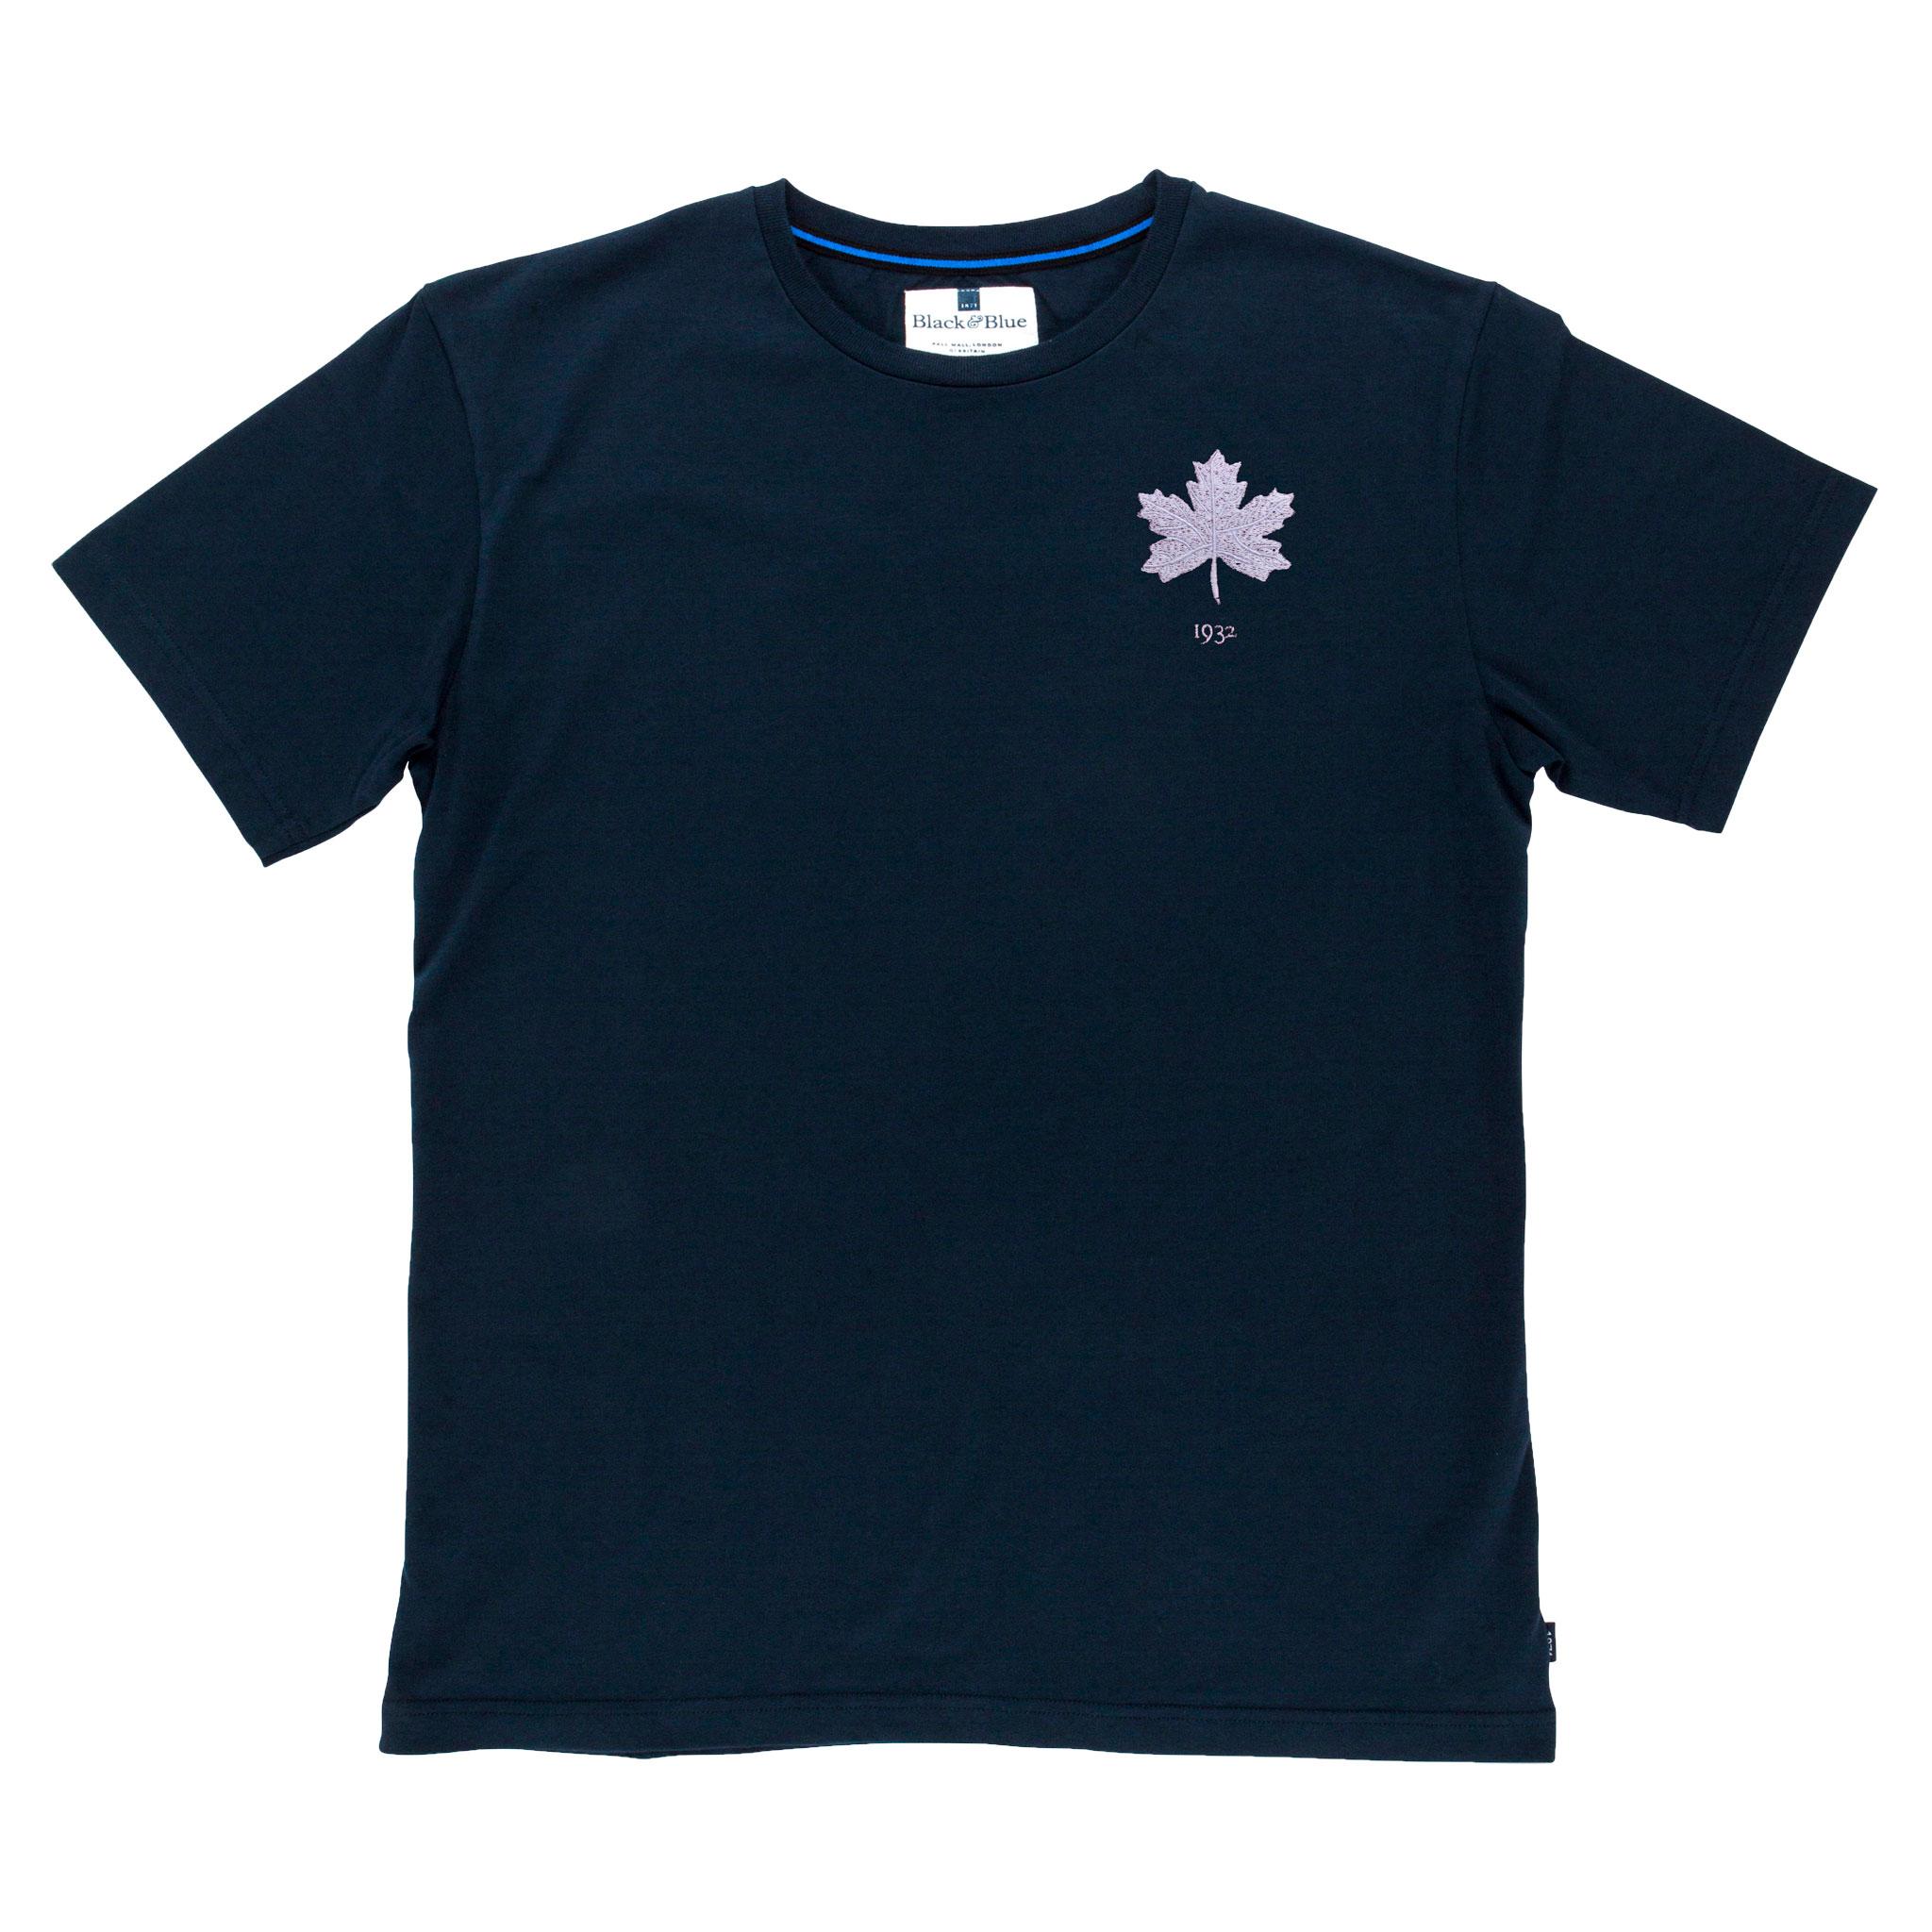 Canada 1932 Navy Tshirt_Front